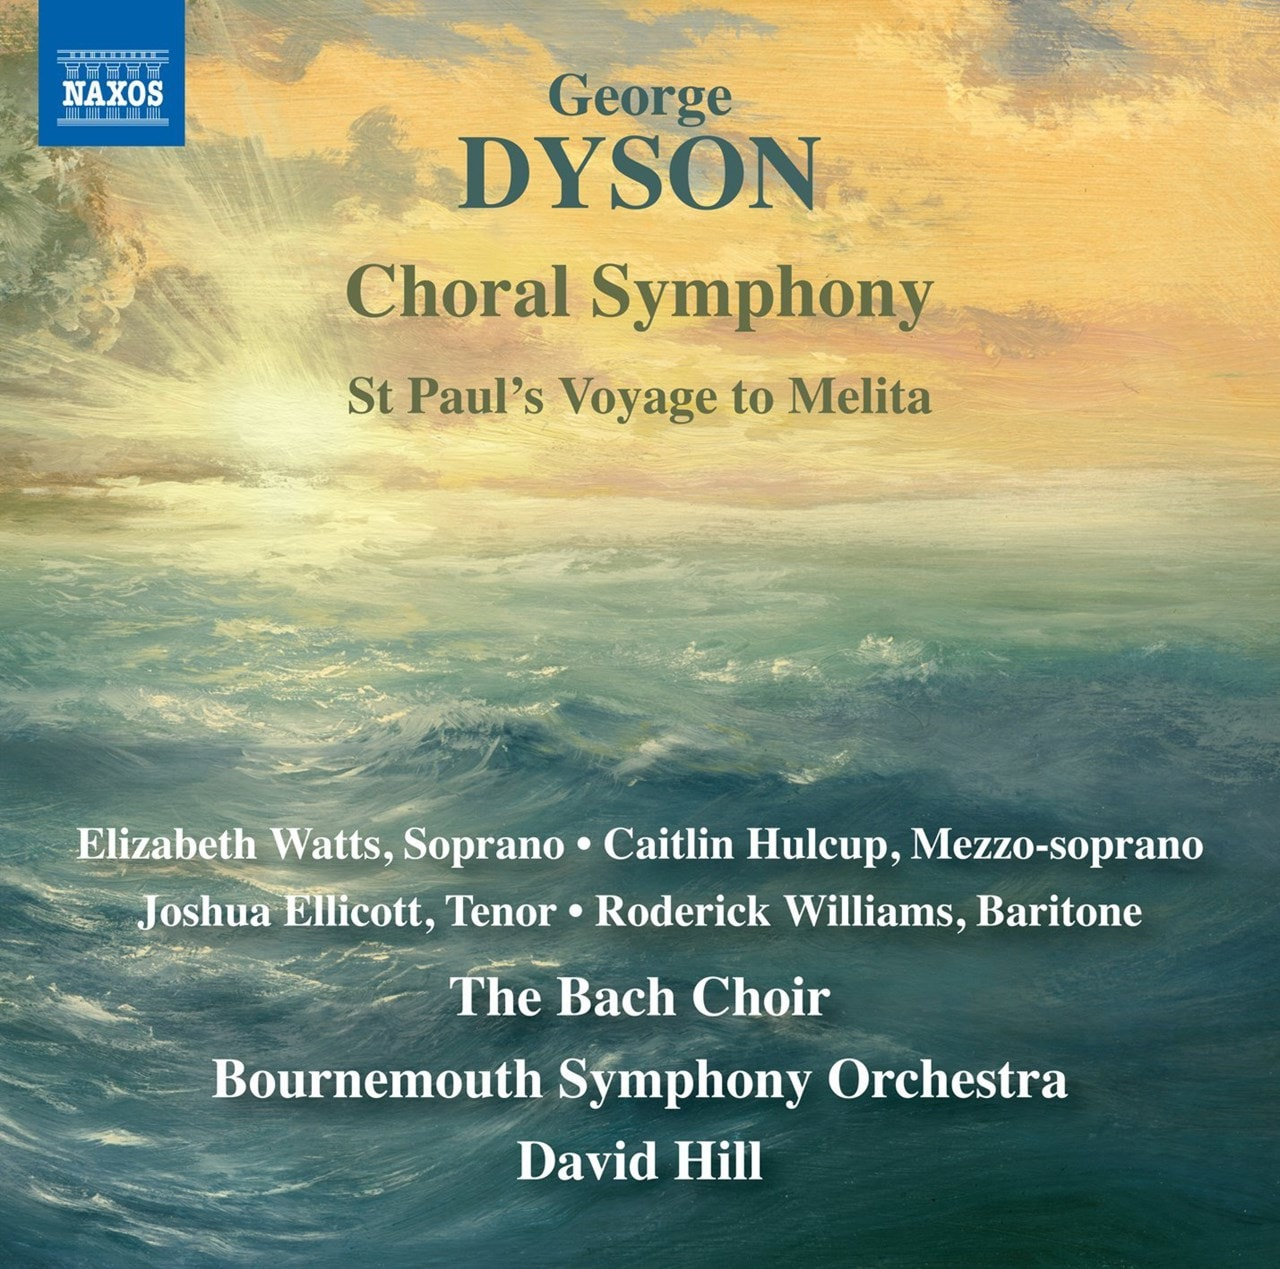 George Dyson: Choral Symphony/St Paul's Voyage to Melita - 1